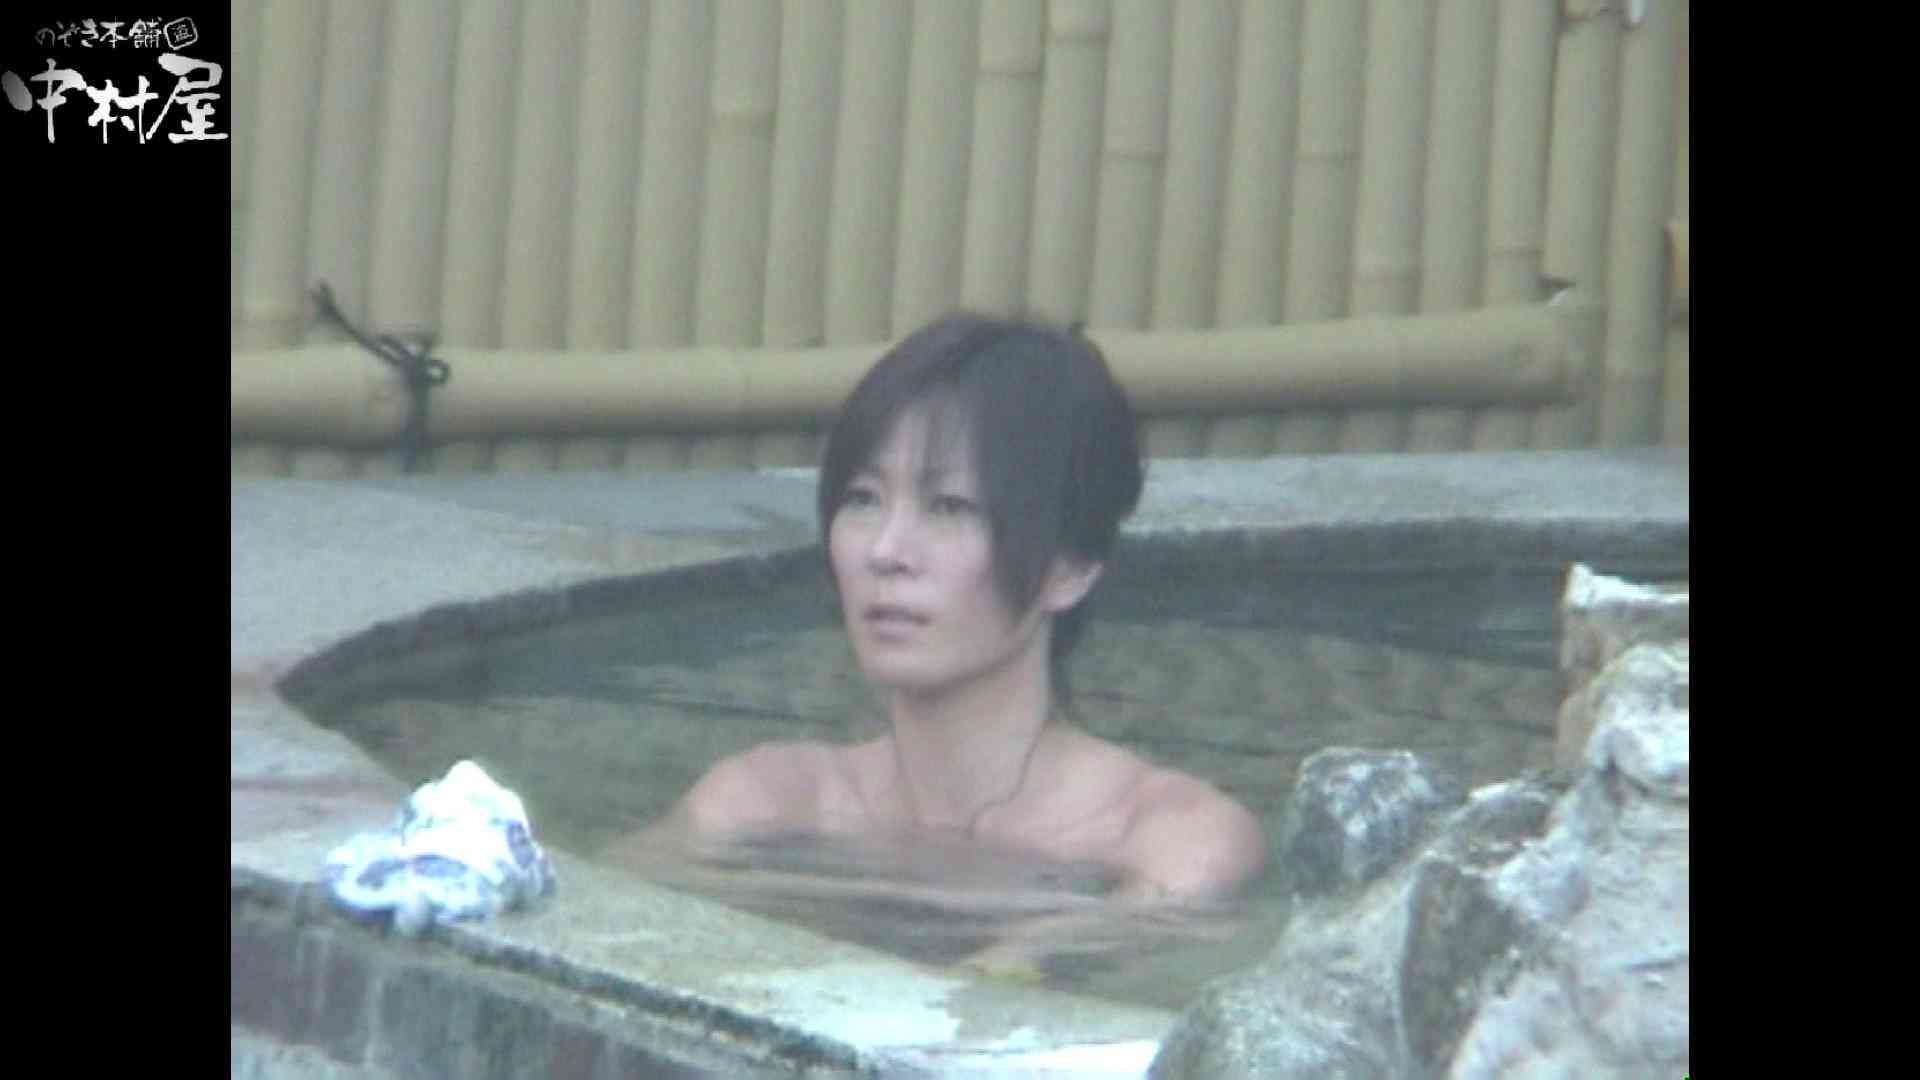 Aquaな露天風呂Vol.972 露天風呂 セックス無修正動画無料 105連発 71